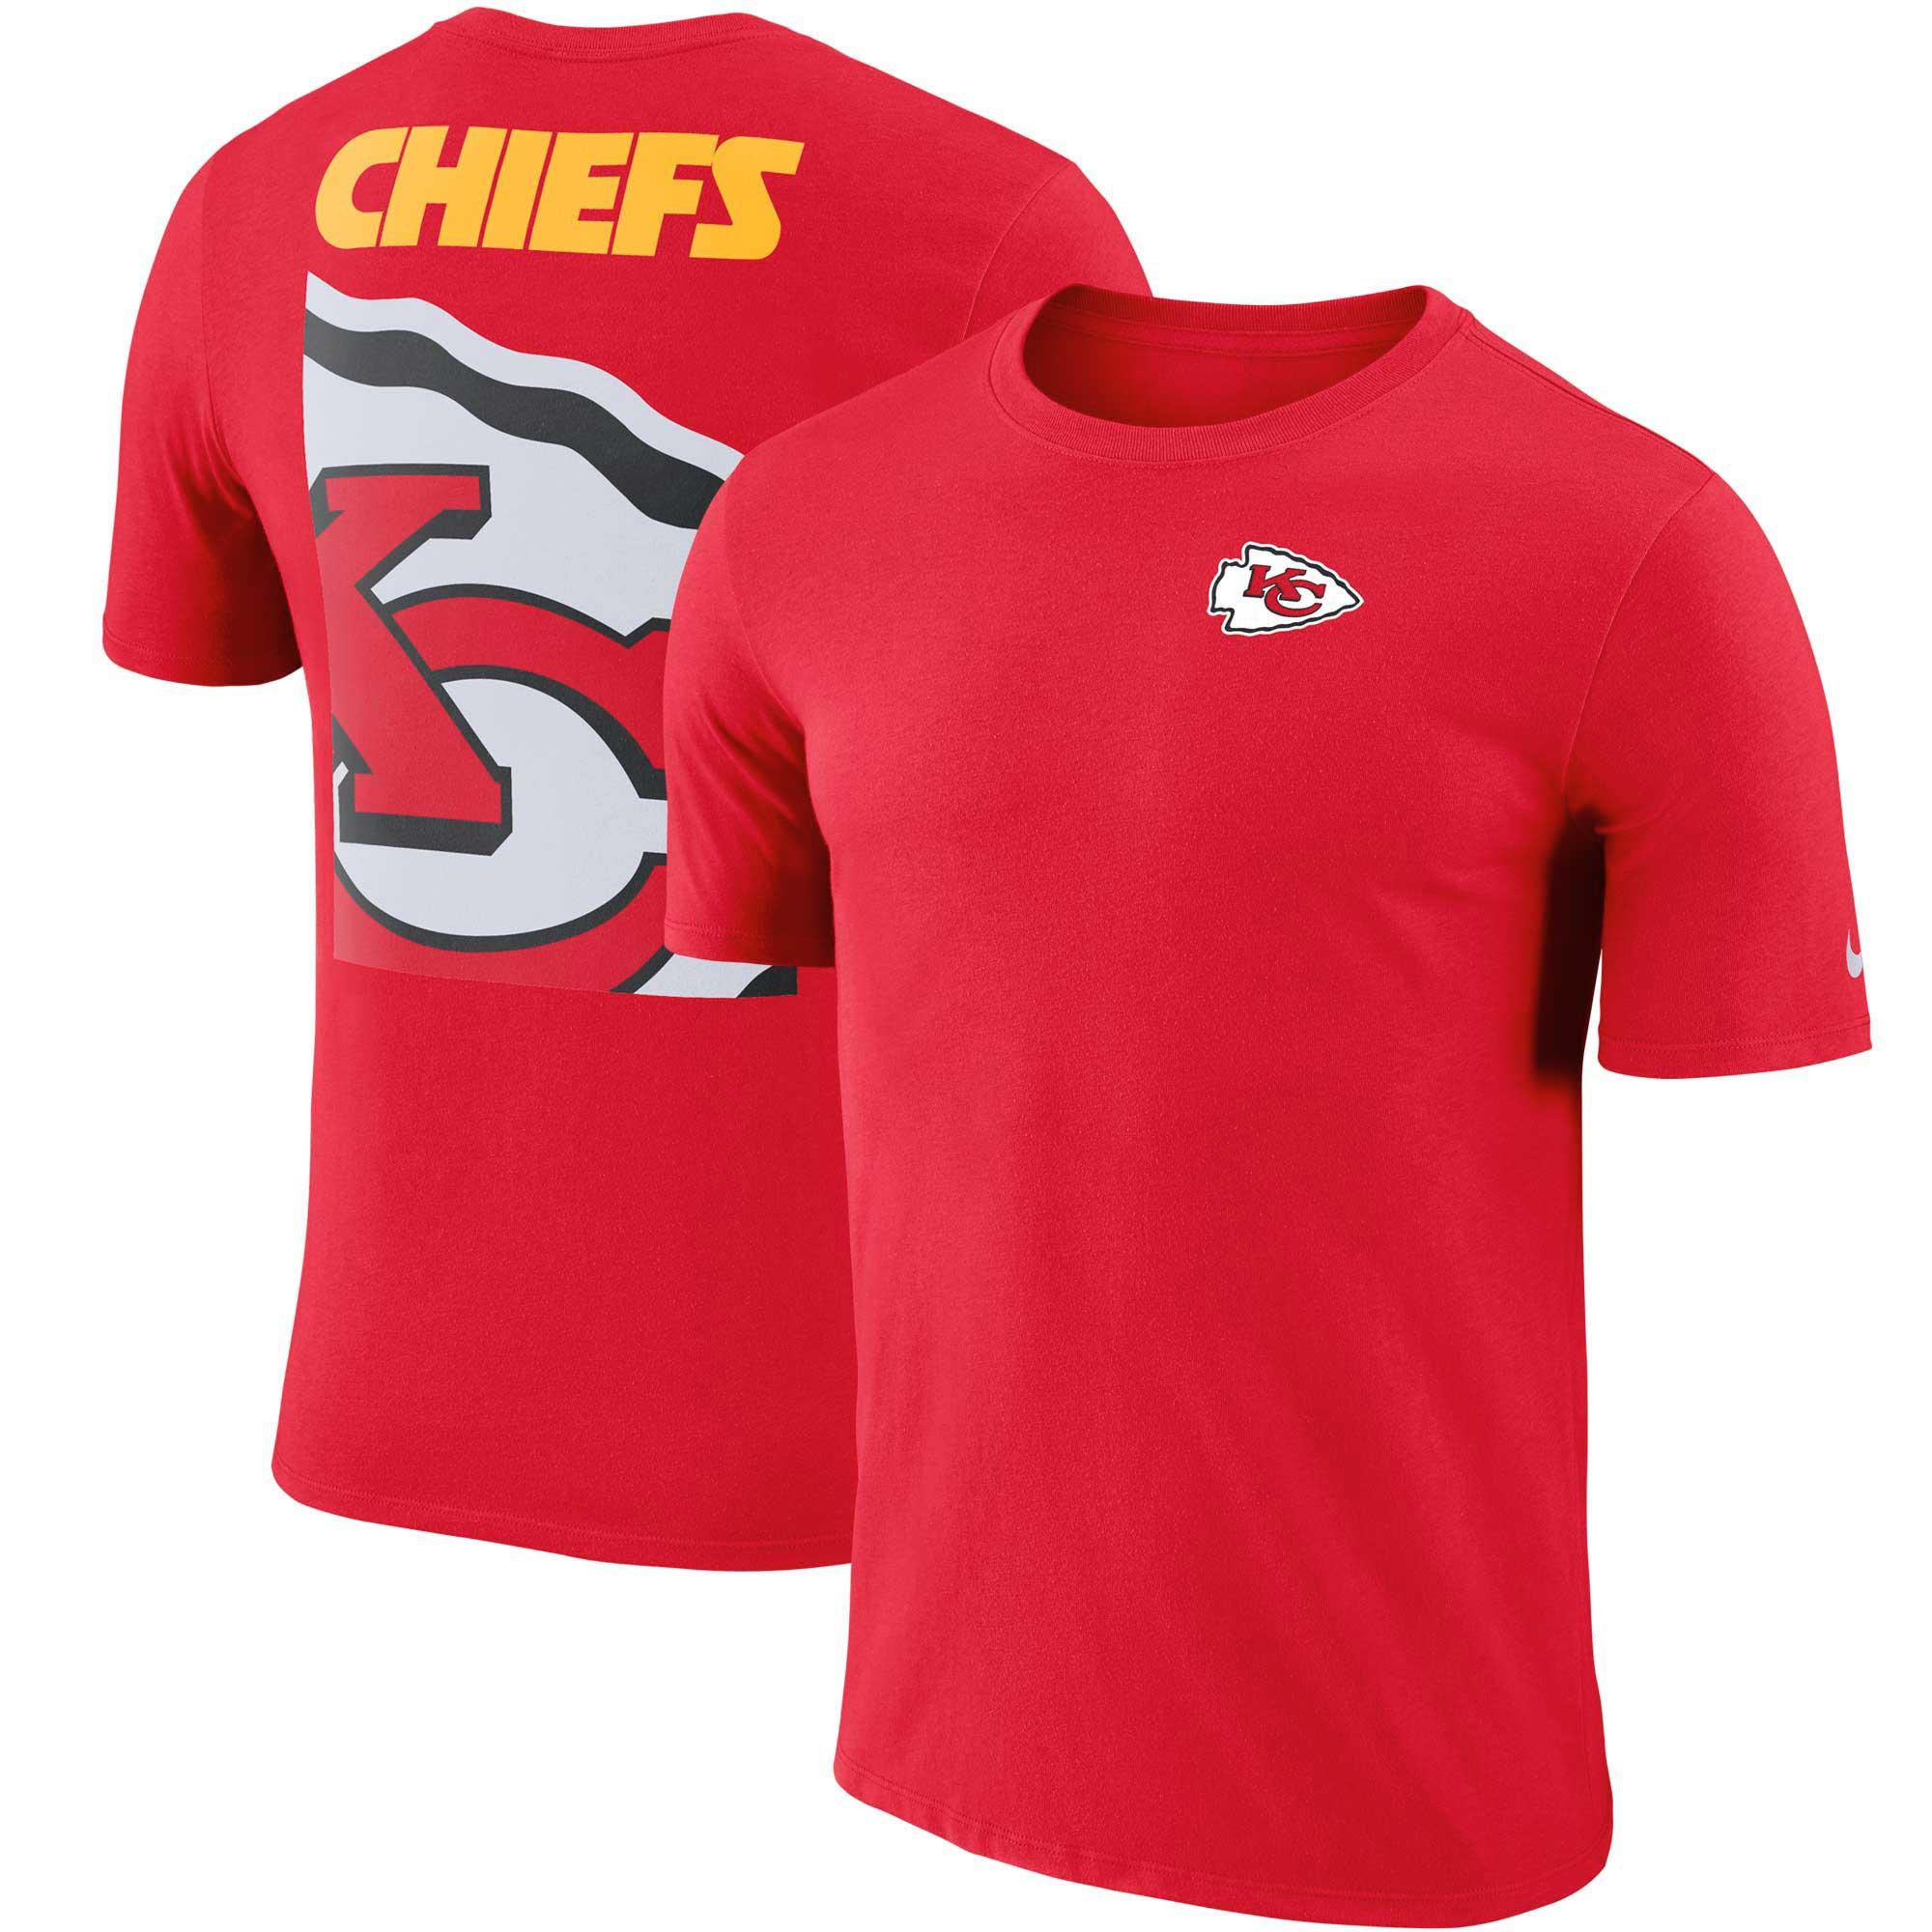 Kansas City Chiefs Nike Performance Crew Champ T-Shirt - Red